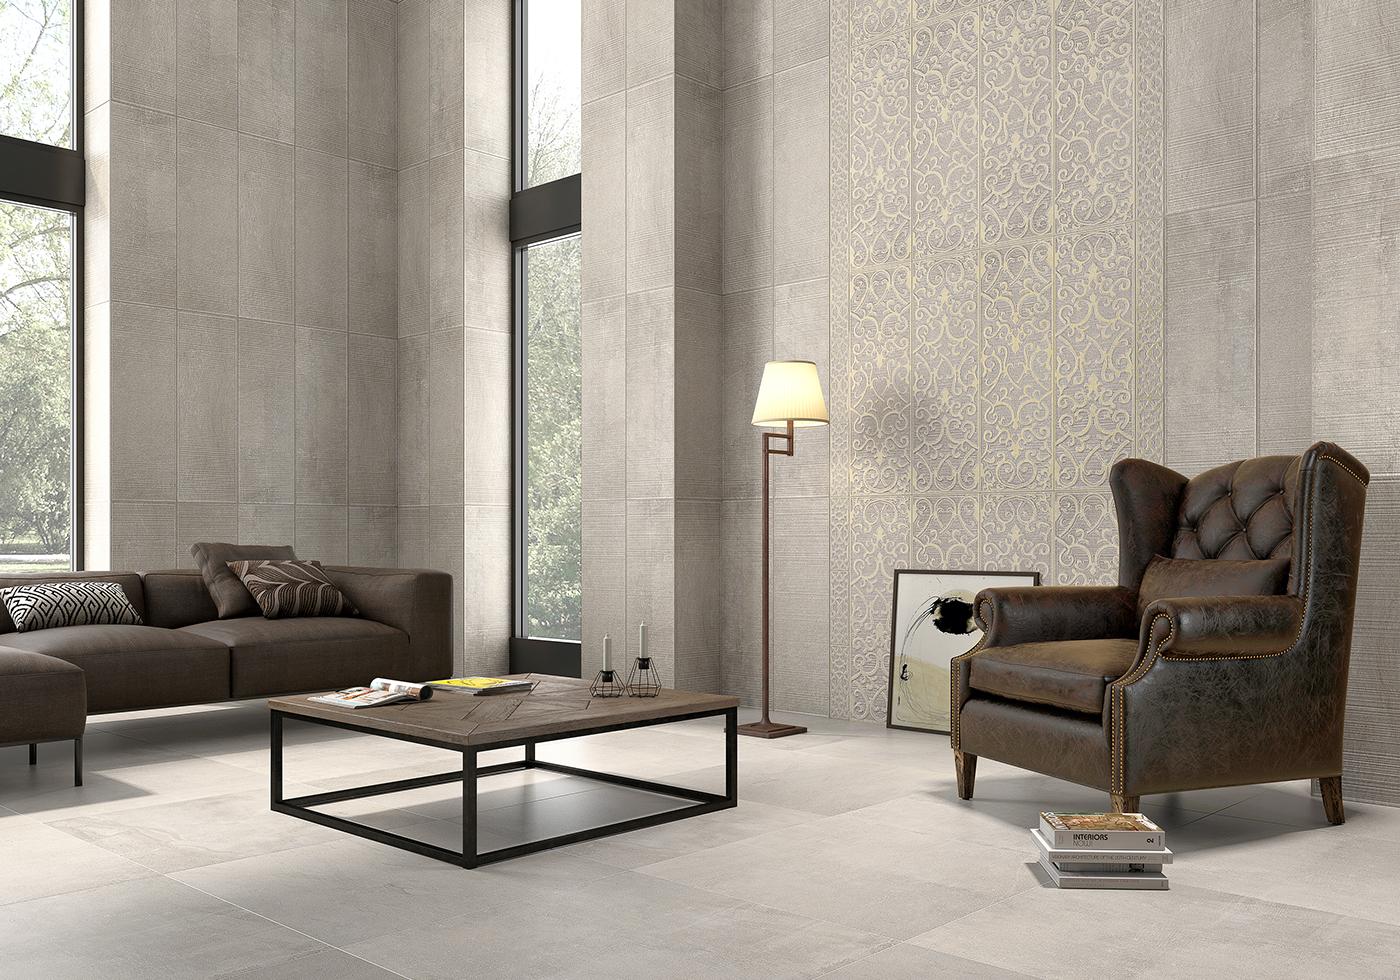 Deja vu wall tiles on behance deja vu ceramic wall tile collection for vitra tiles doublecrazyfo Choice Image